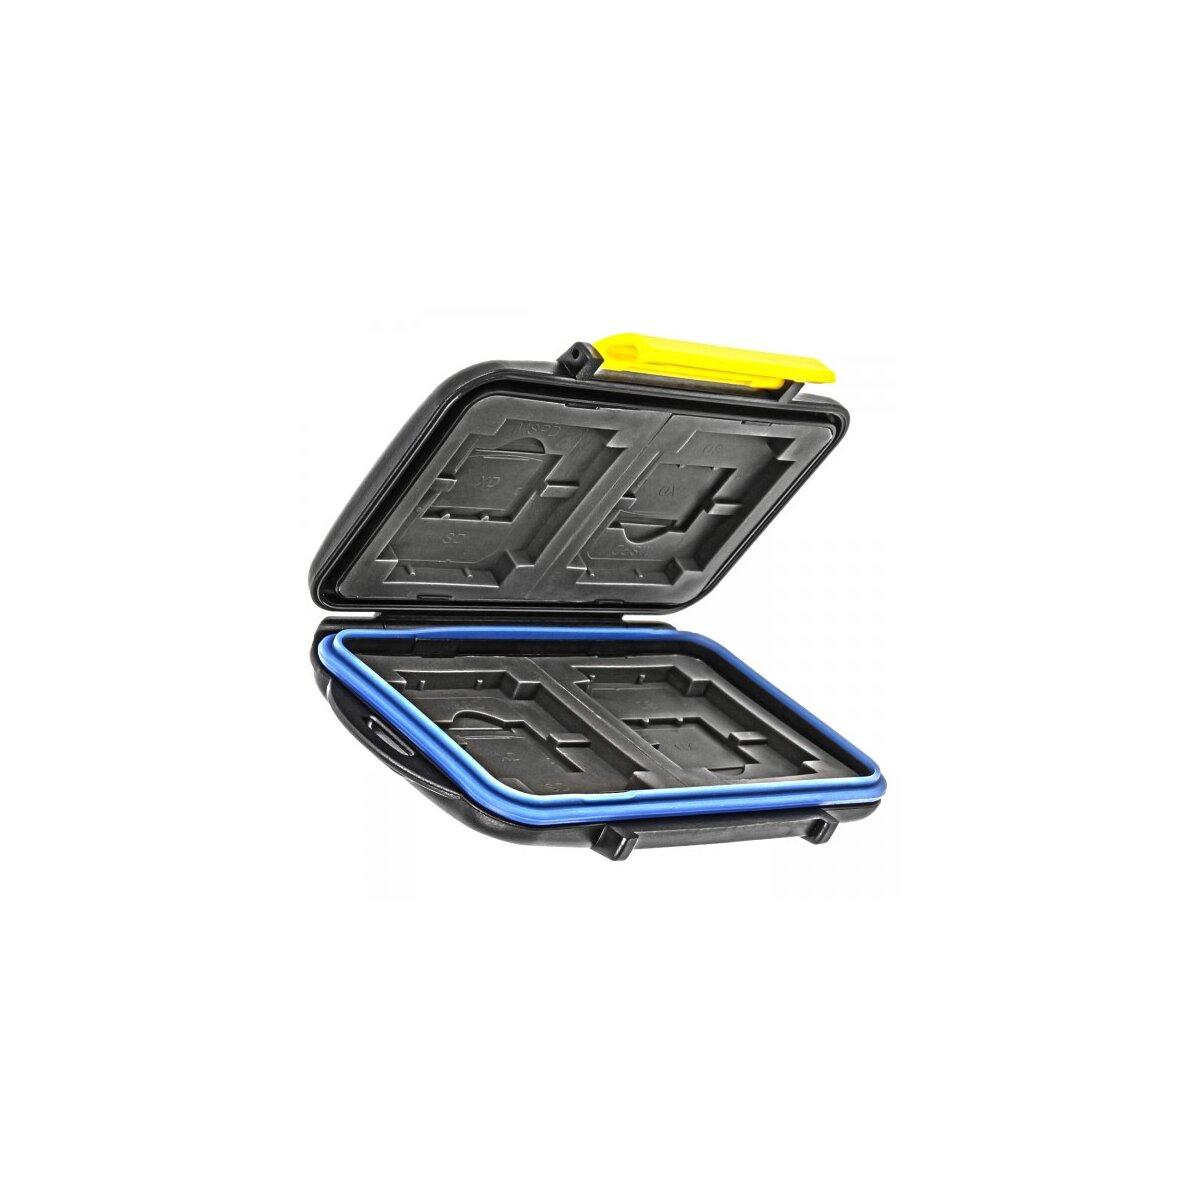 Speicherkarten-Etui Aufbewahrungsbox fuer 4x CF, 4x XD-Card, 4x SD-Card, 4x Memory Stick Pro Duo